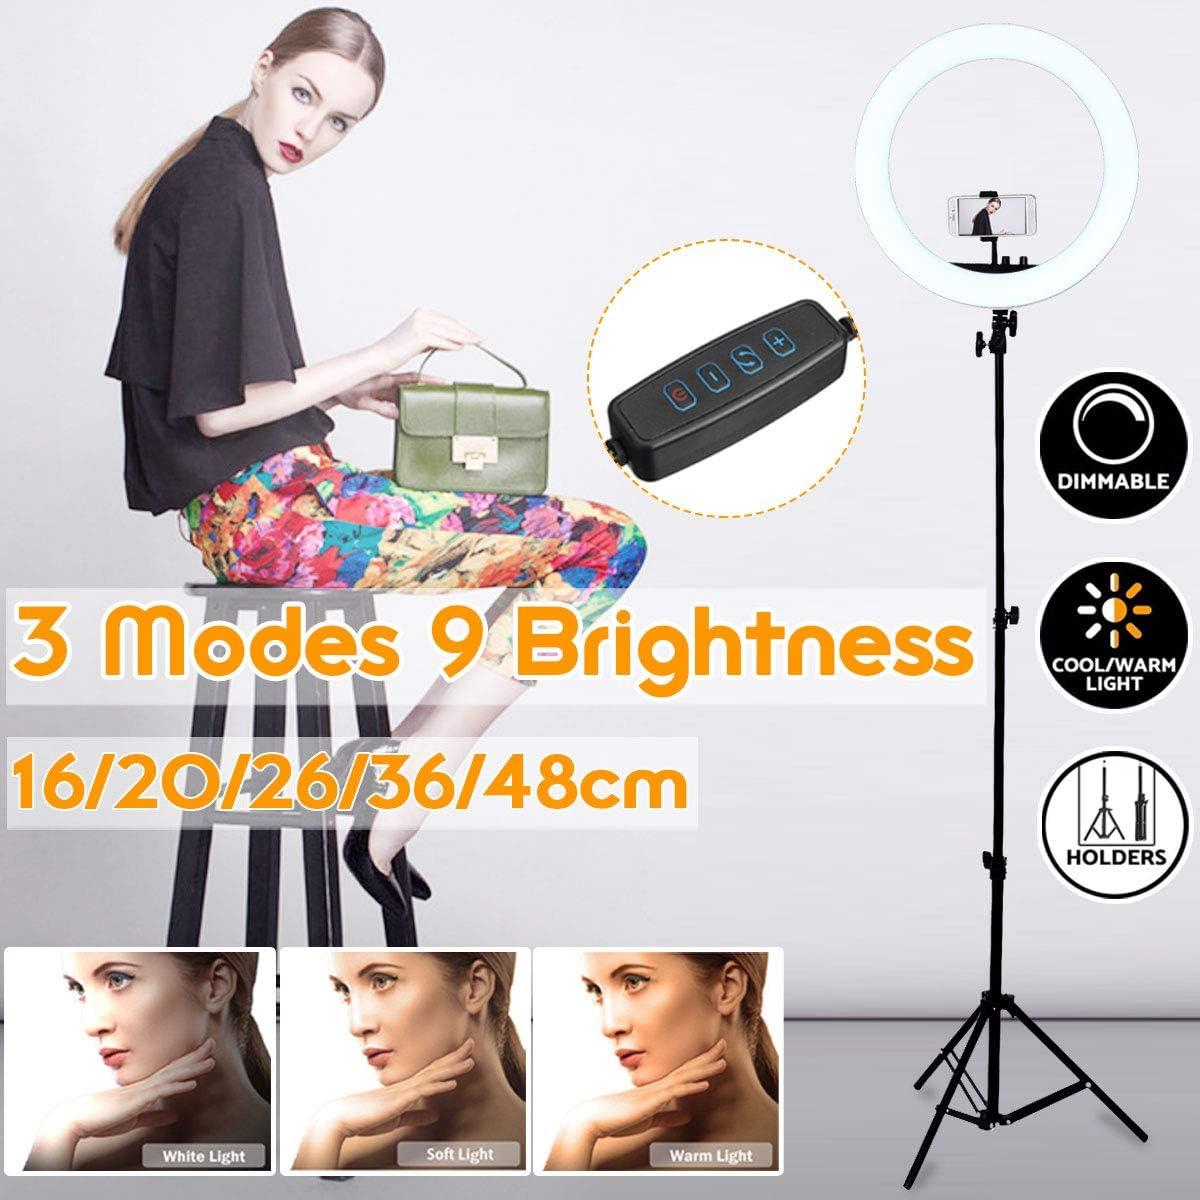 16//20//26//36//48cm Pography LED Selfie Ring Light Camera Phone Ring Lamp Video Live Studio Light For Makeup Video Live Studio DELAMZ